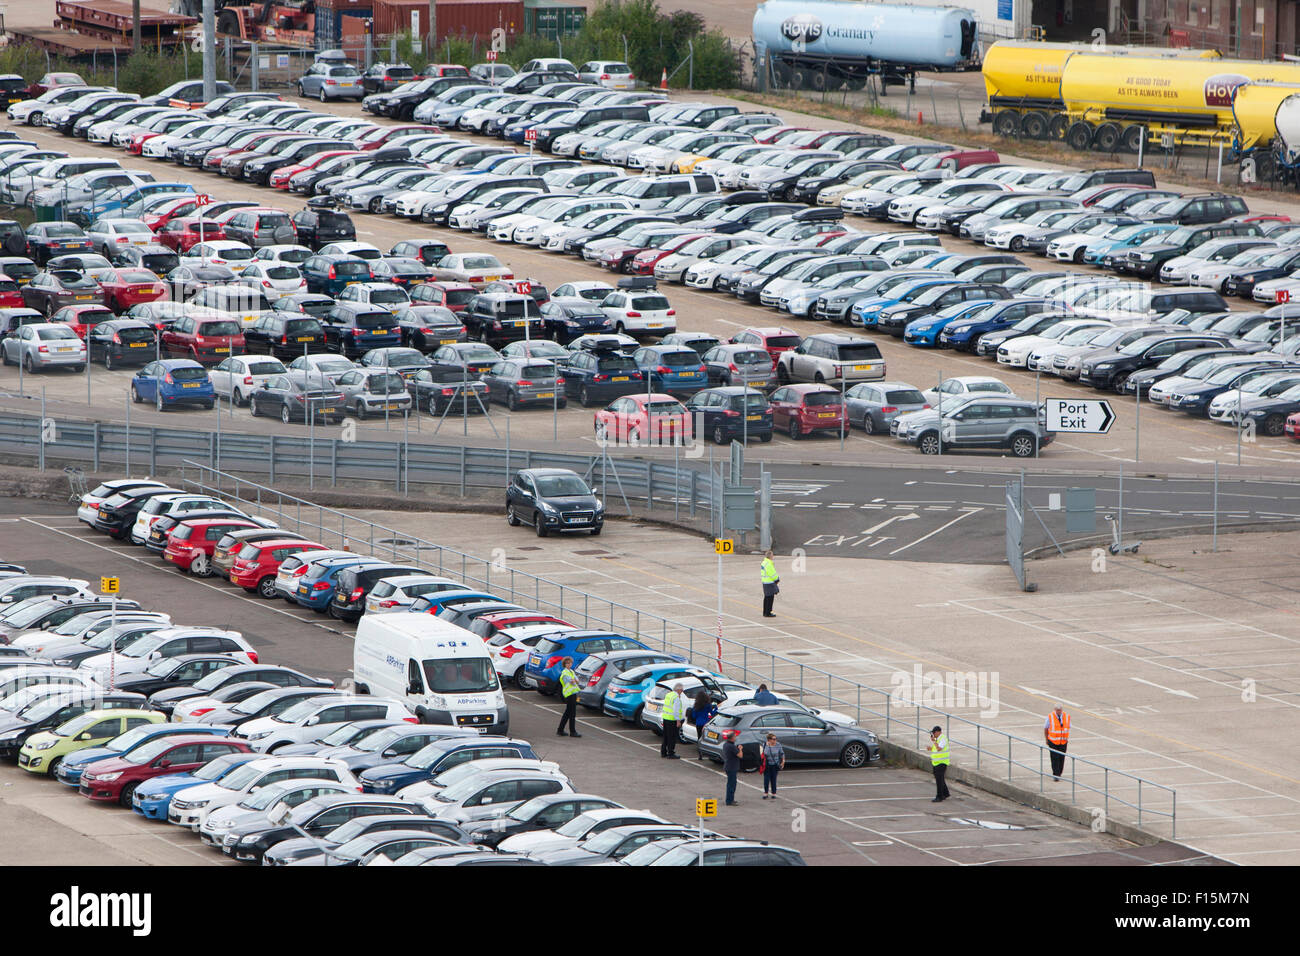 Car Parking At Southampton Docks Herbert Walker Ave Mayflower - Southampton cruise ship parking